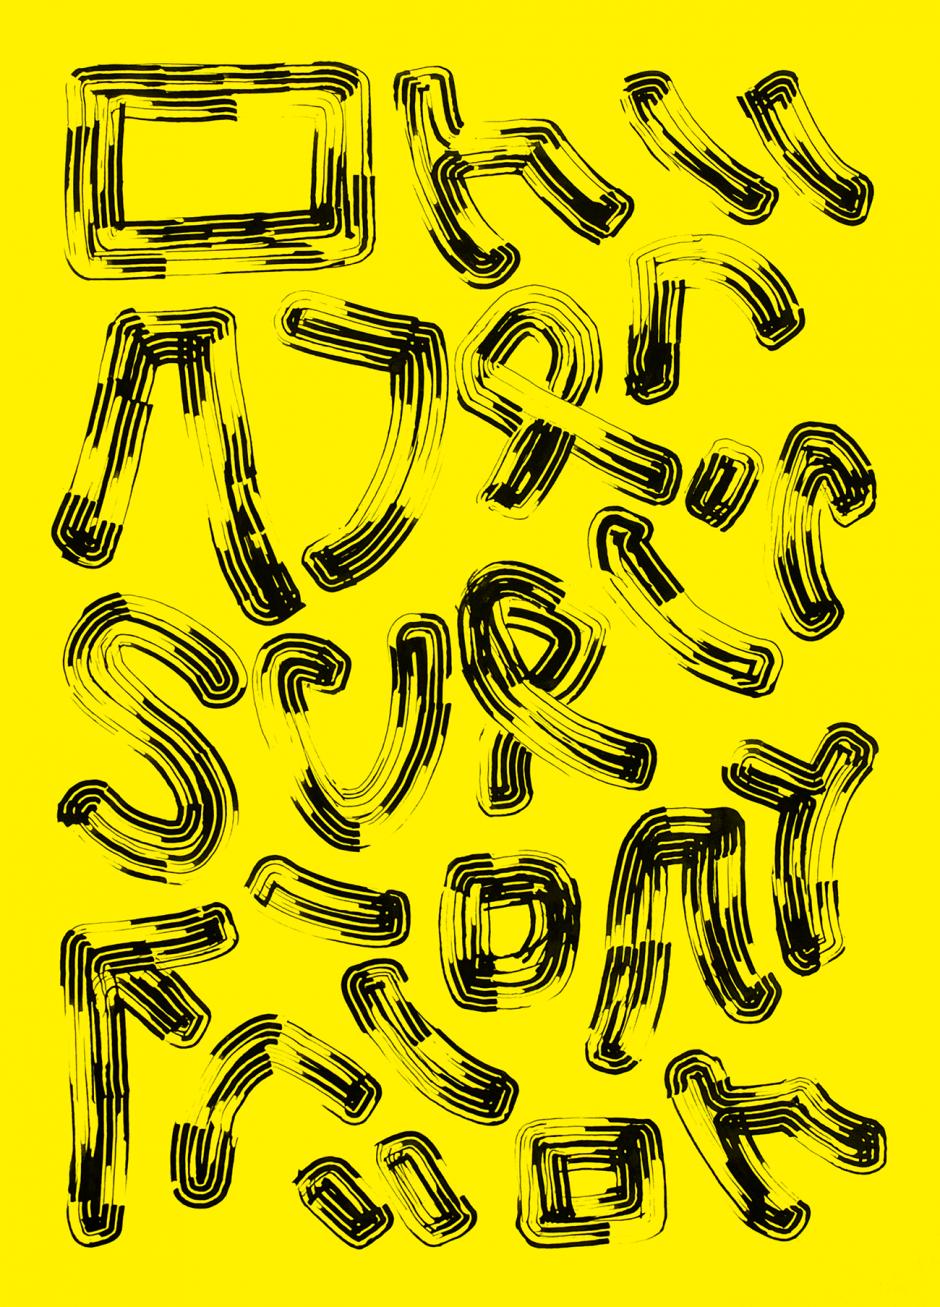 Analoges Poster, mit DesignExperience Kollektiv Superfreitag8000